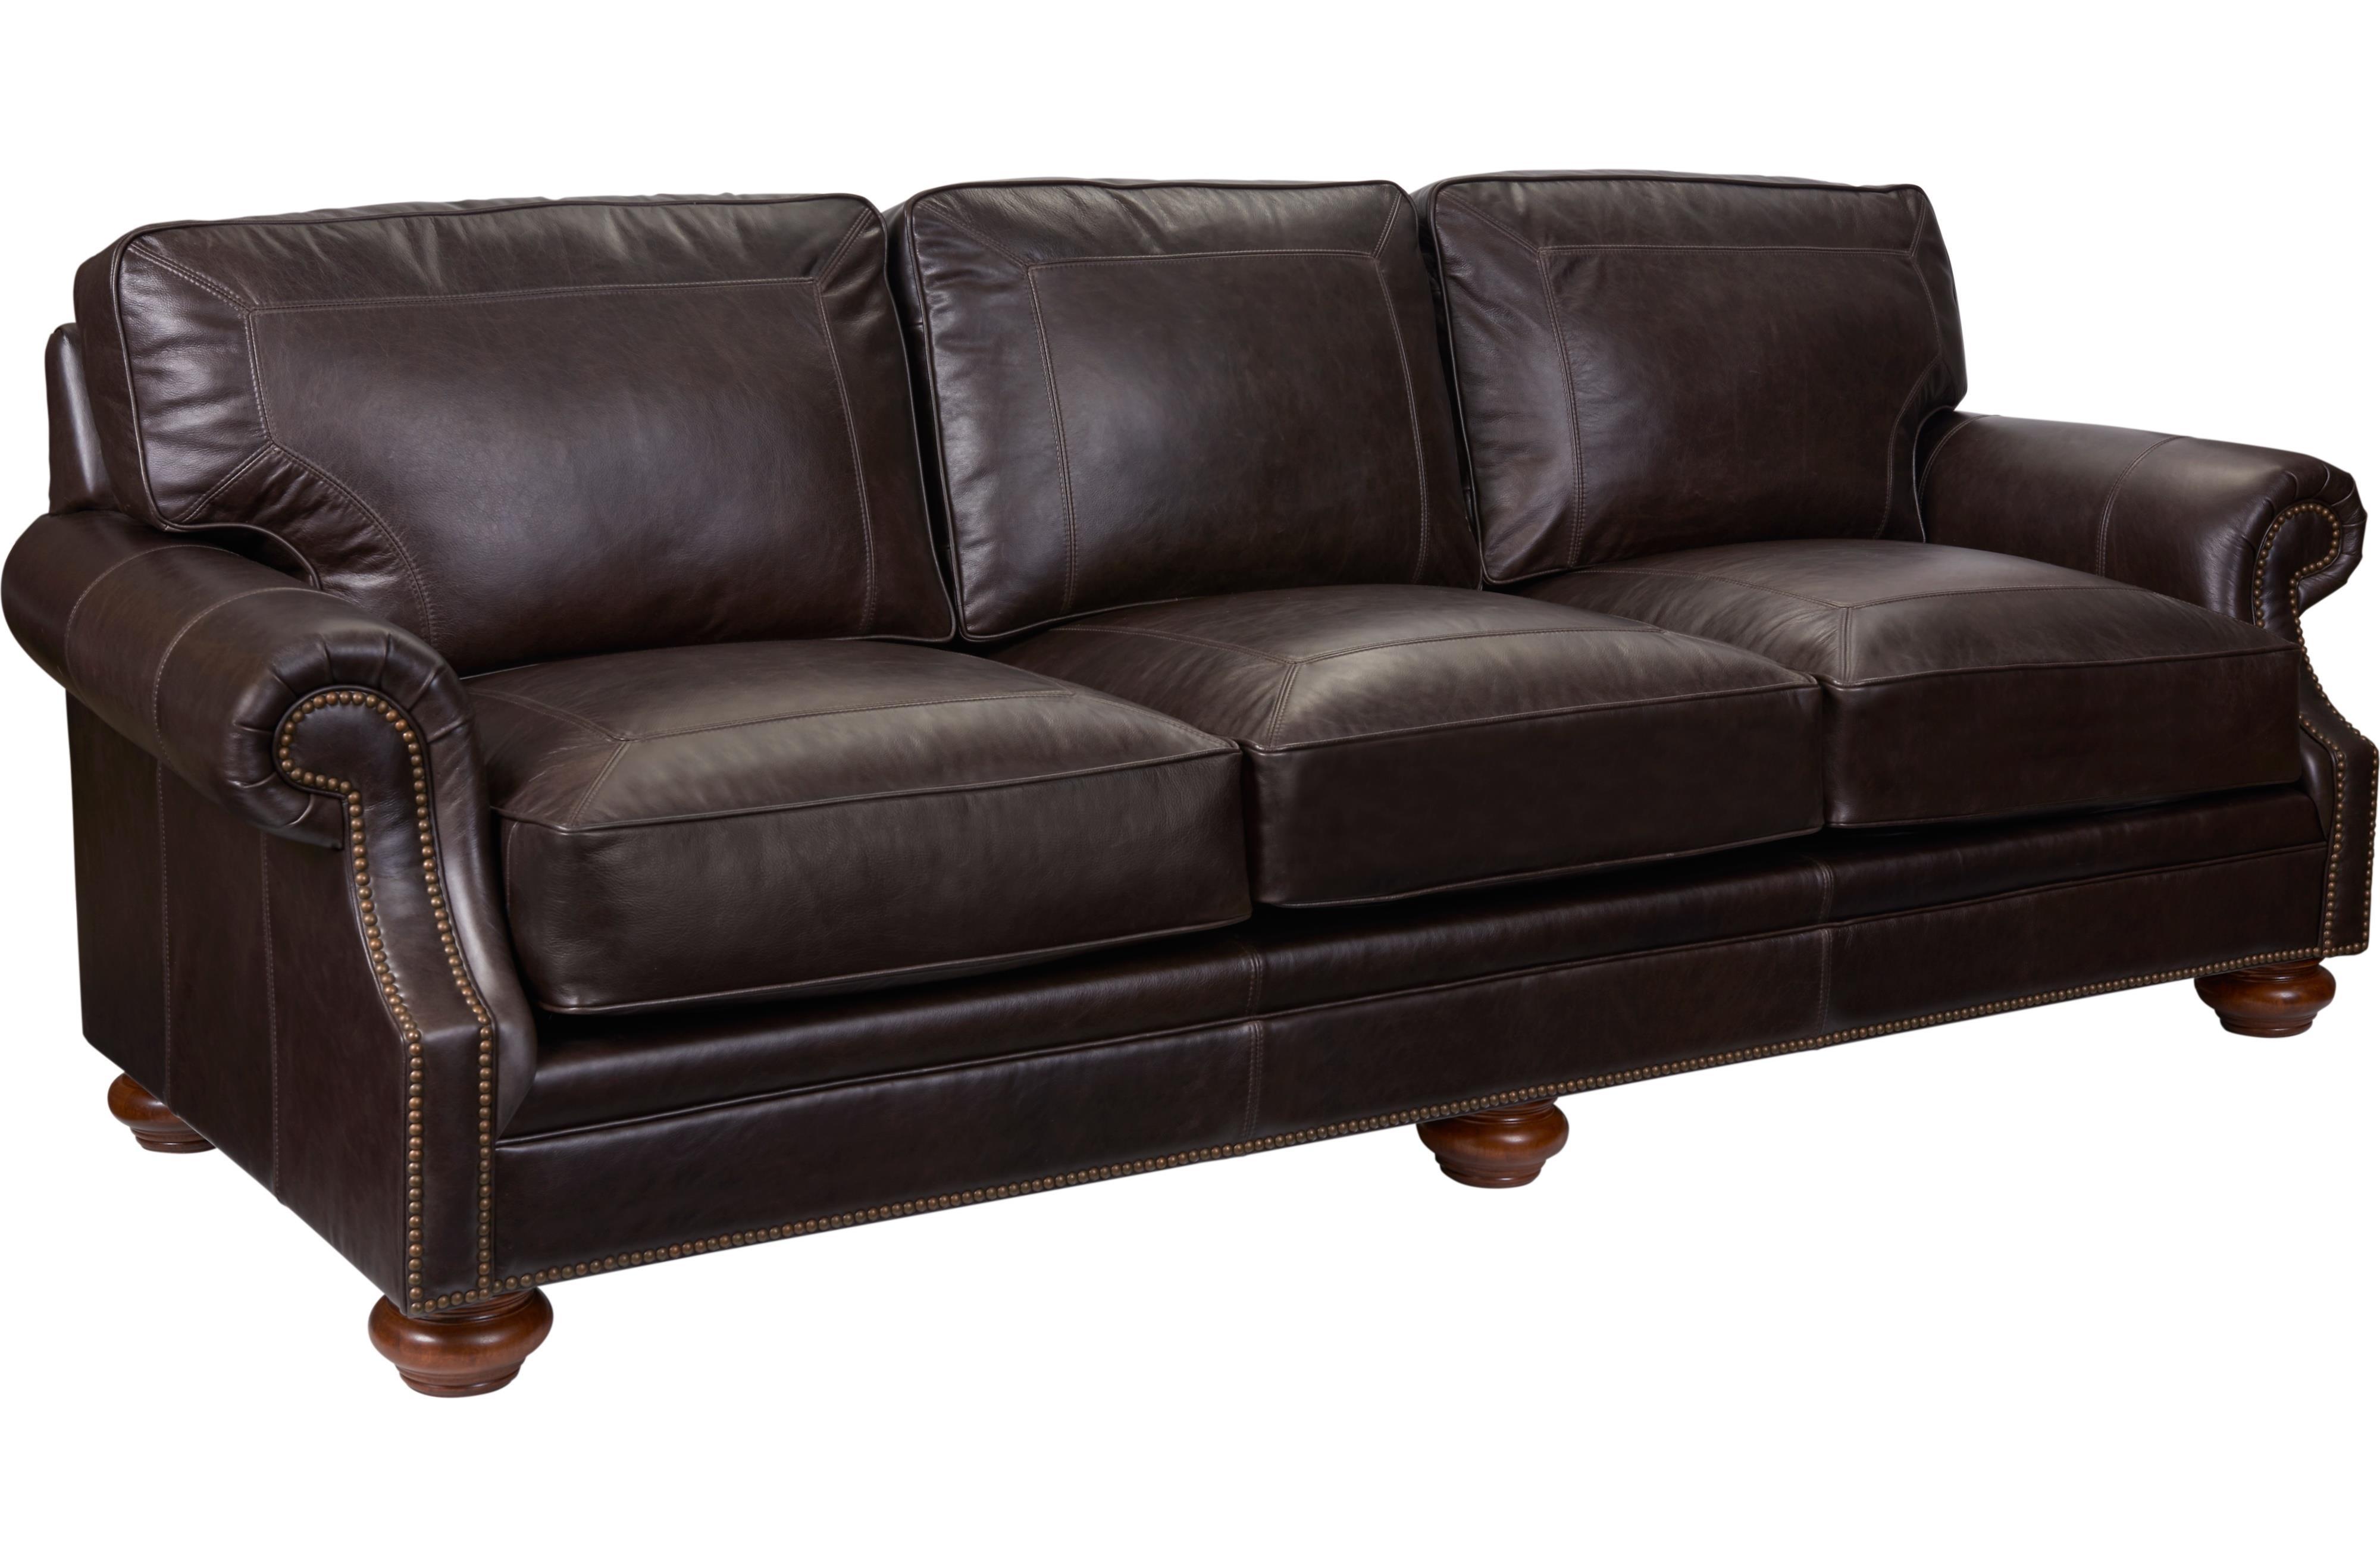 Broyhill Furniture Heuer Sofa - Item Number: L4260-3-0012-89